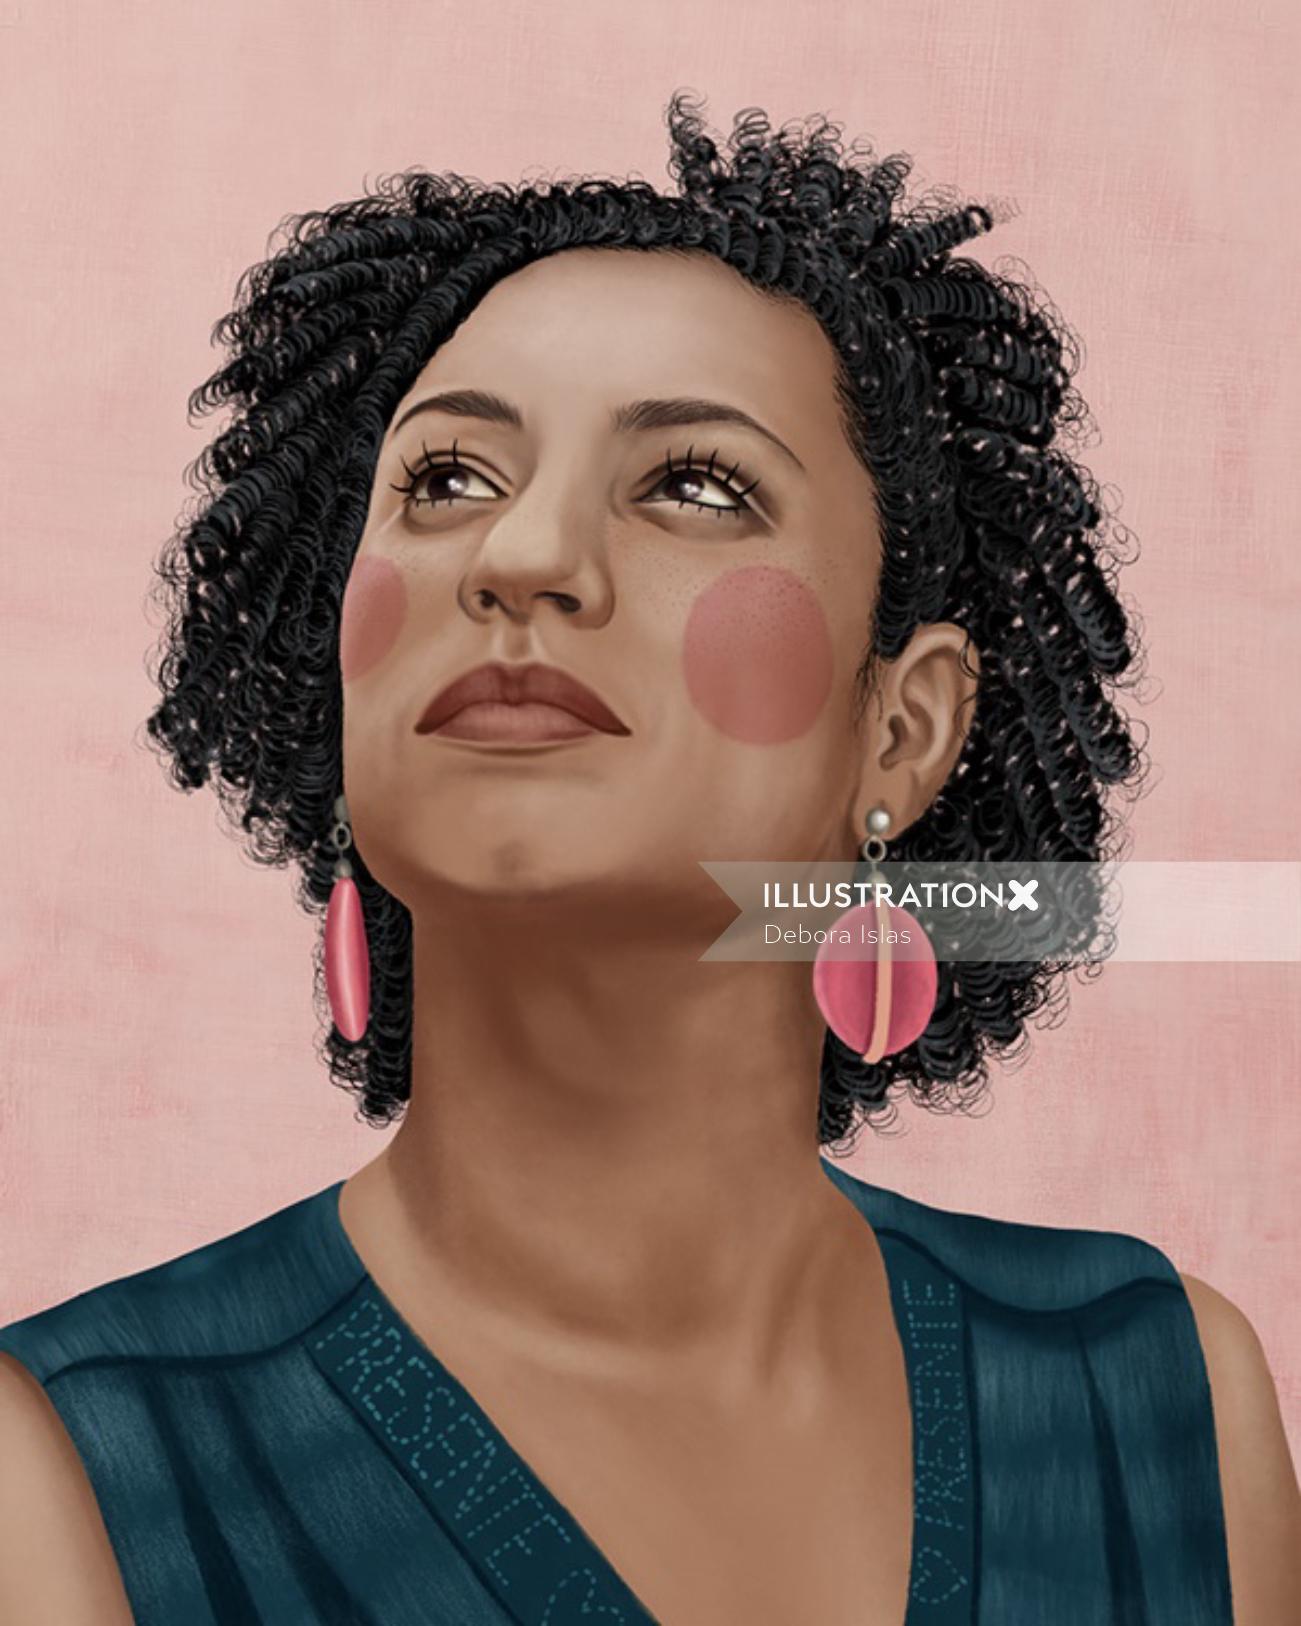 Portrait illustration of Marielle Franco